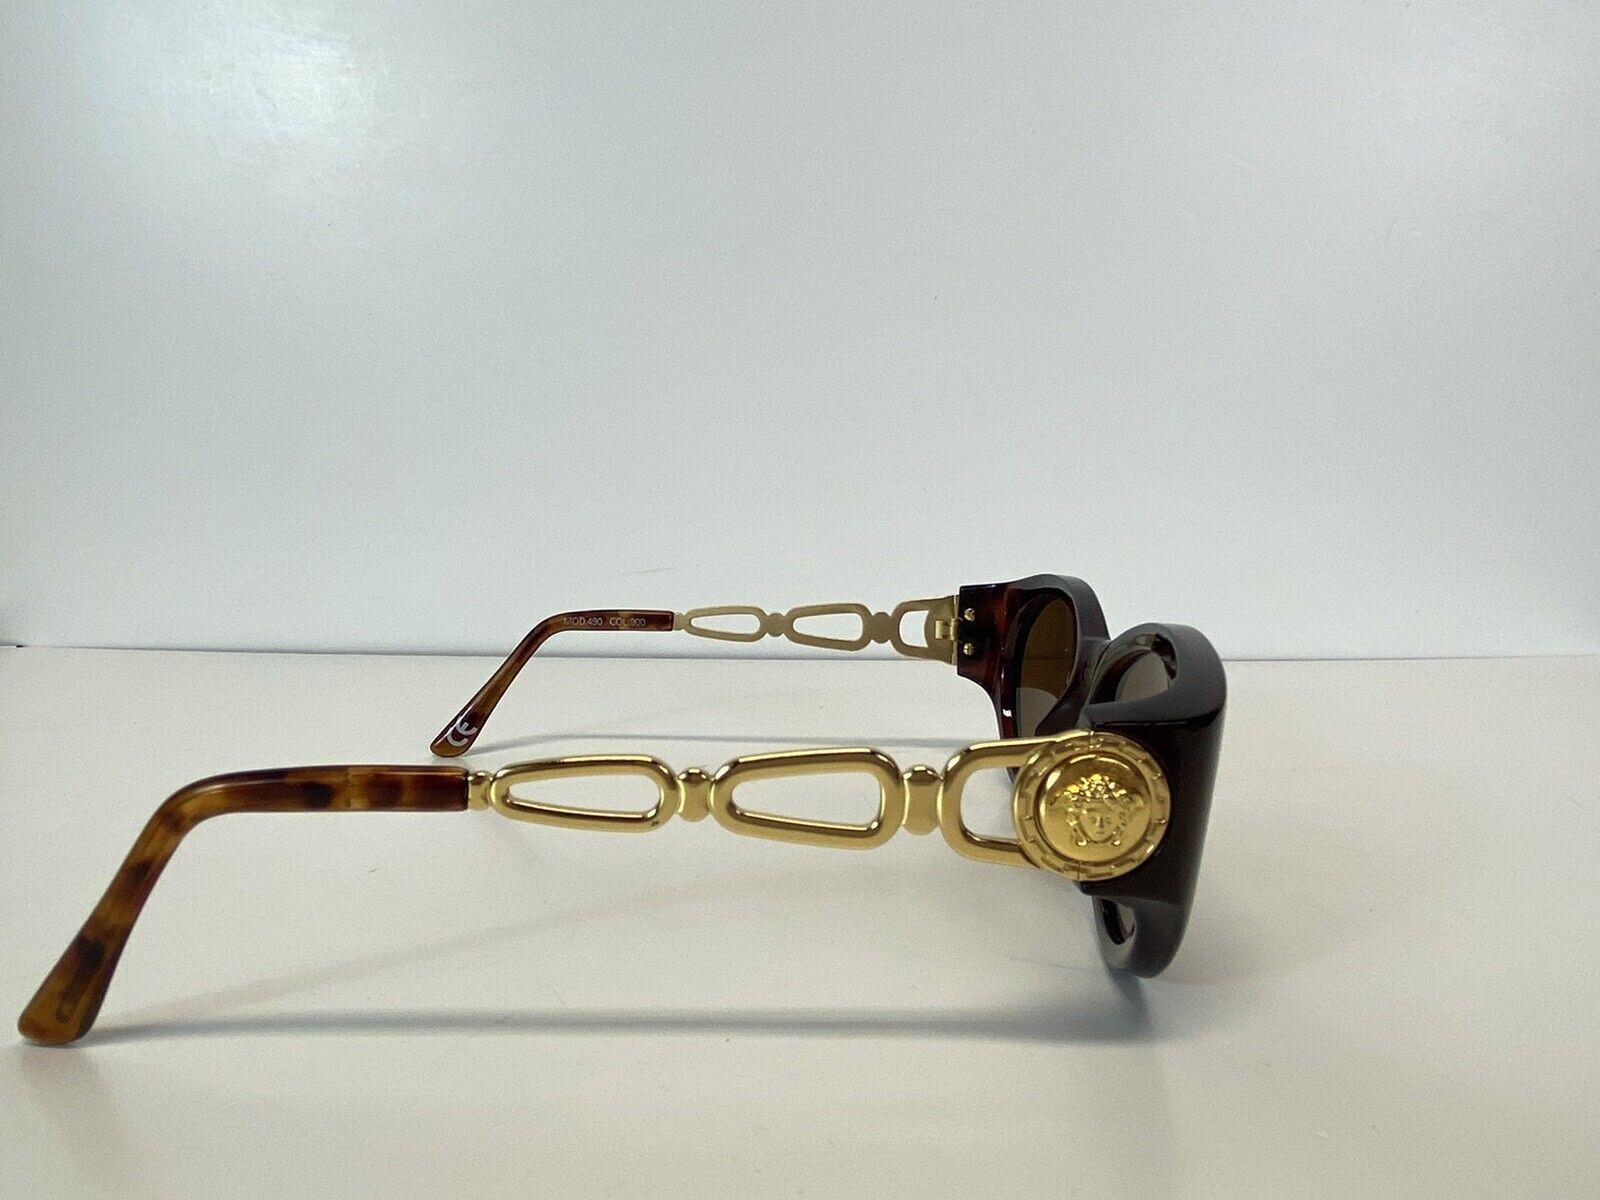 Rare Vtg Gianni Versace Brown Gold Medusa Sunglas… - image 4